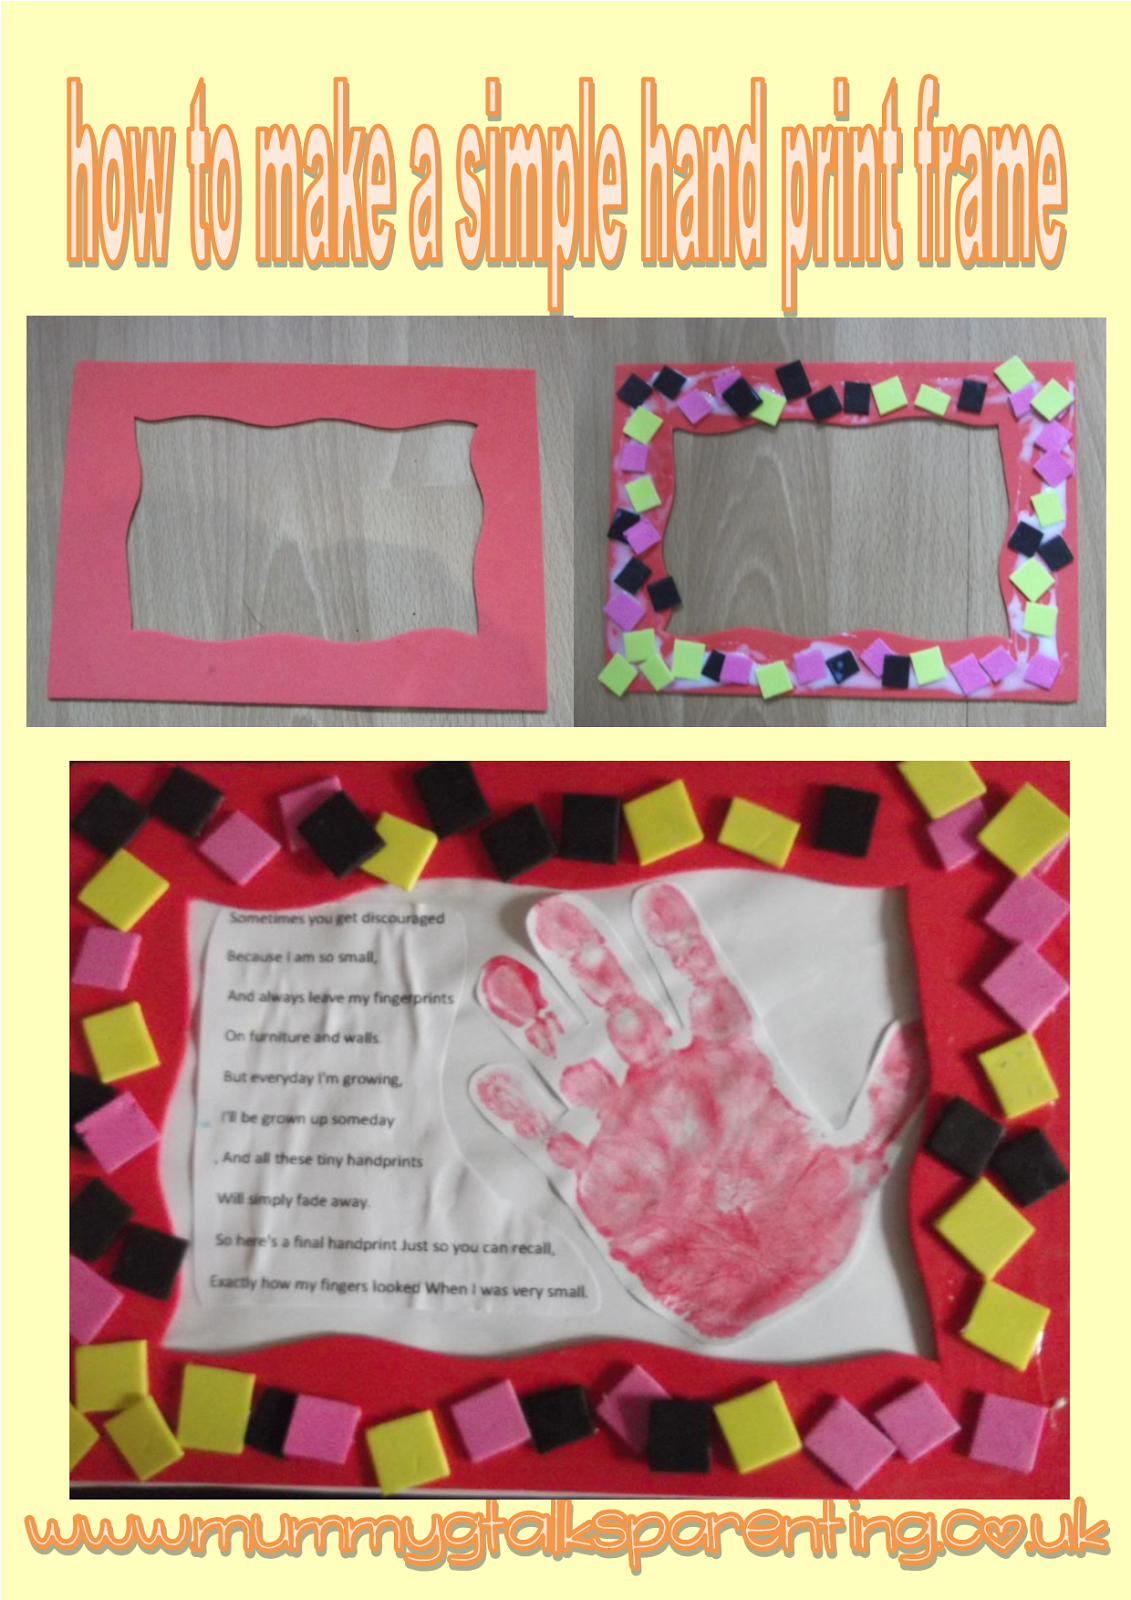 How to make a simple handprint frame mummy g talks parenting how to make a simple handprint frame mummy g talks parenting jeuxipadfo Image collections